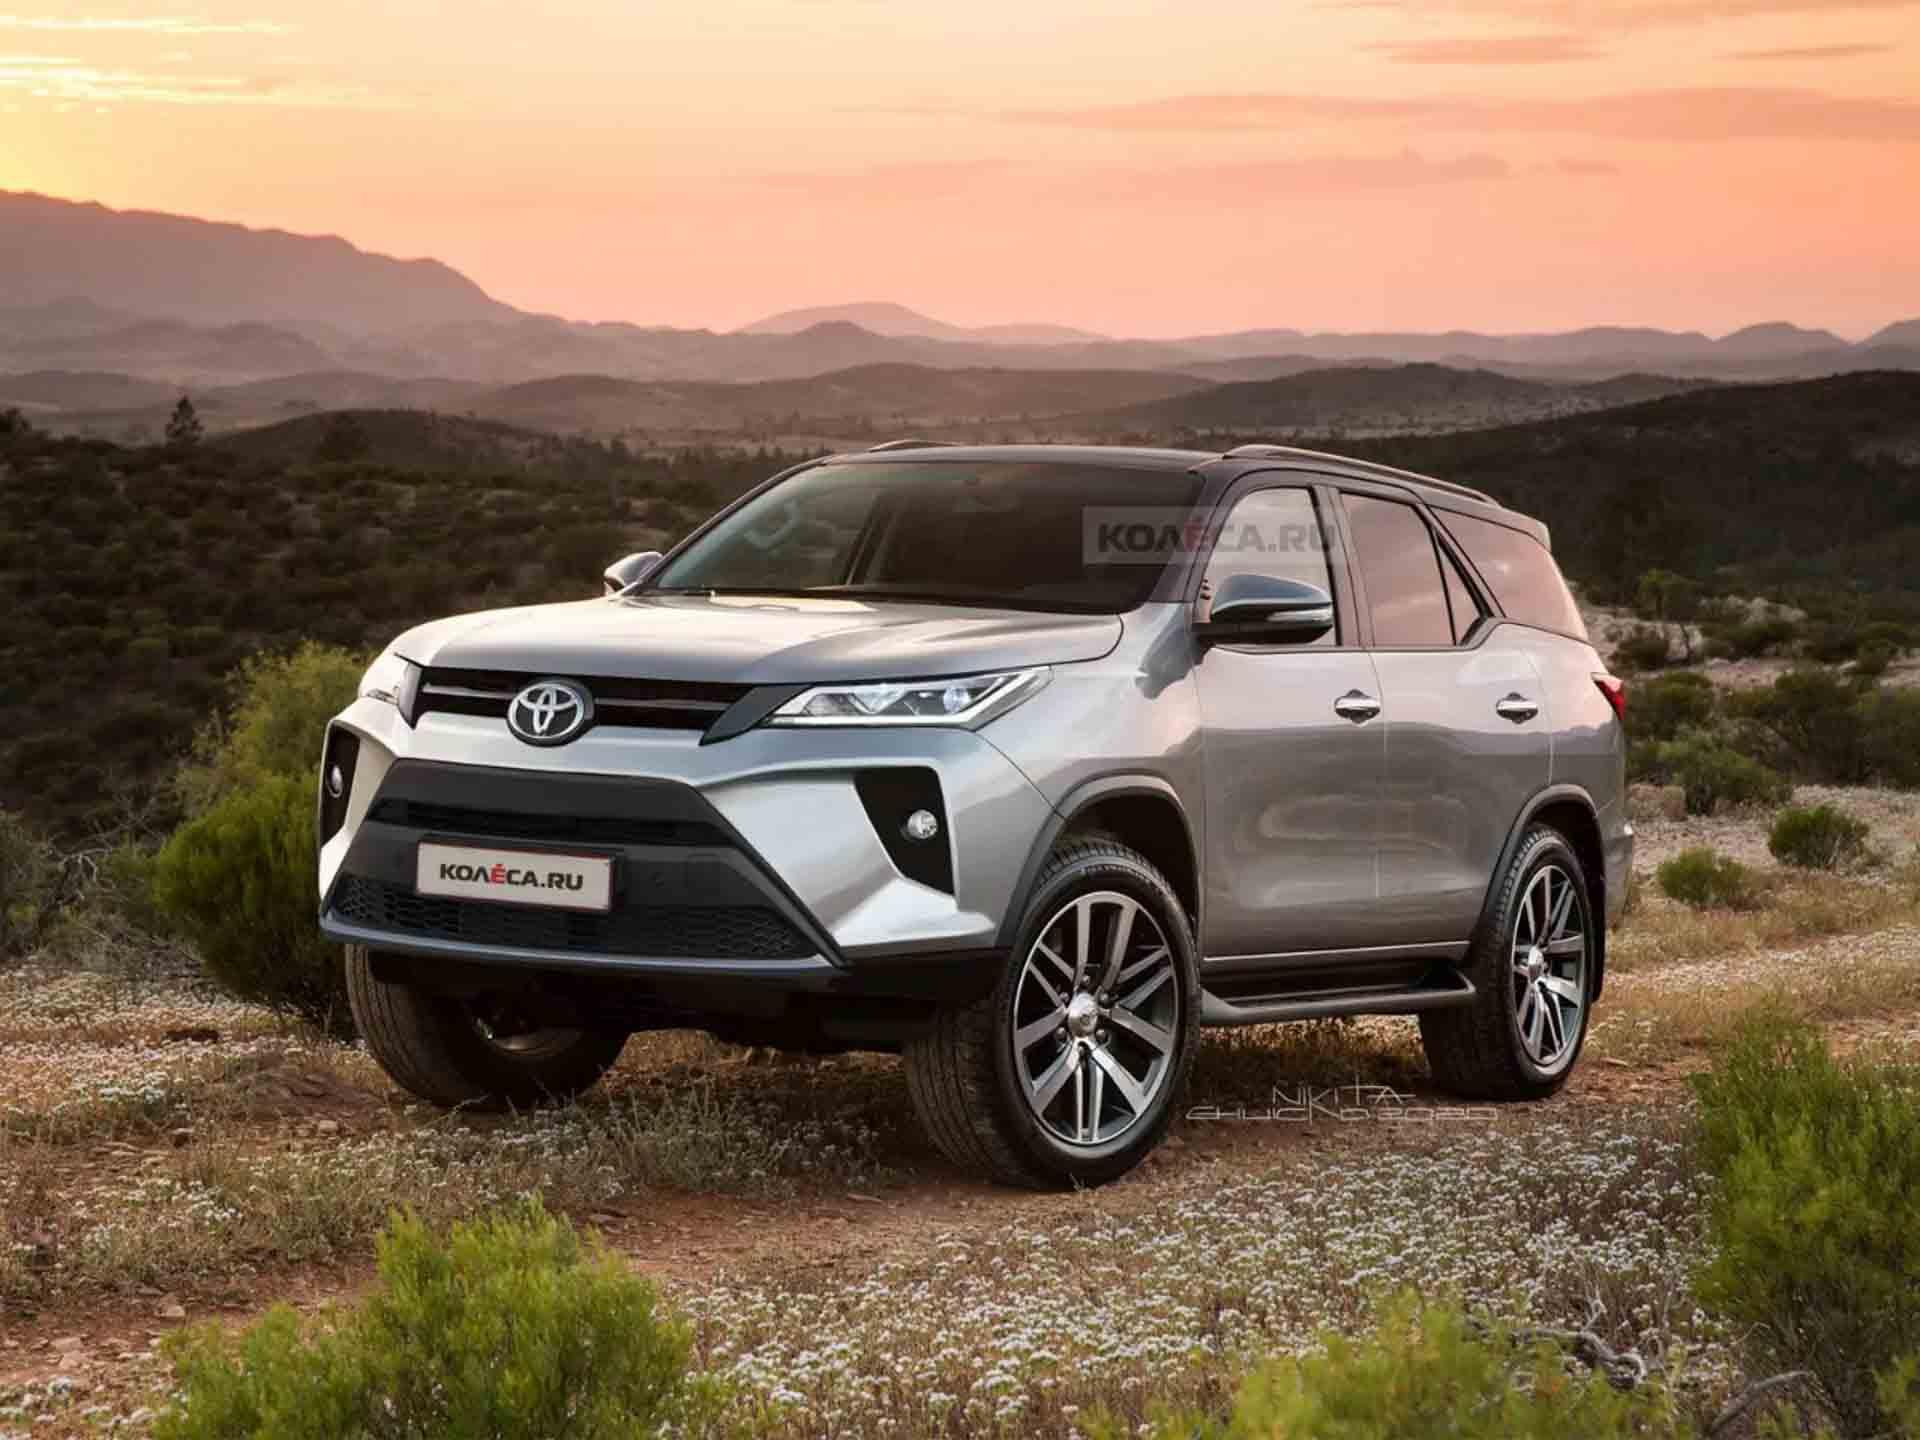 2021 Toyota Fortuner Facelift's Front, Rear Designs Rendered